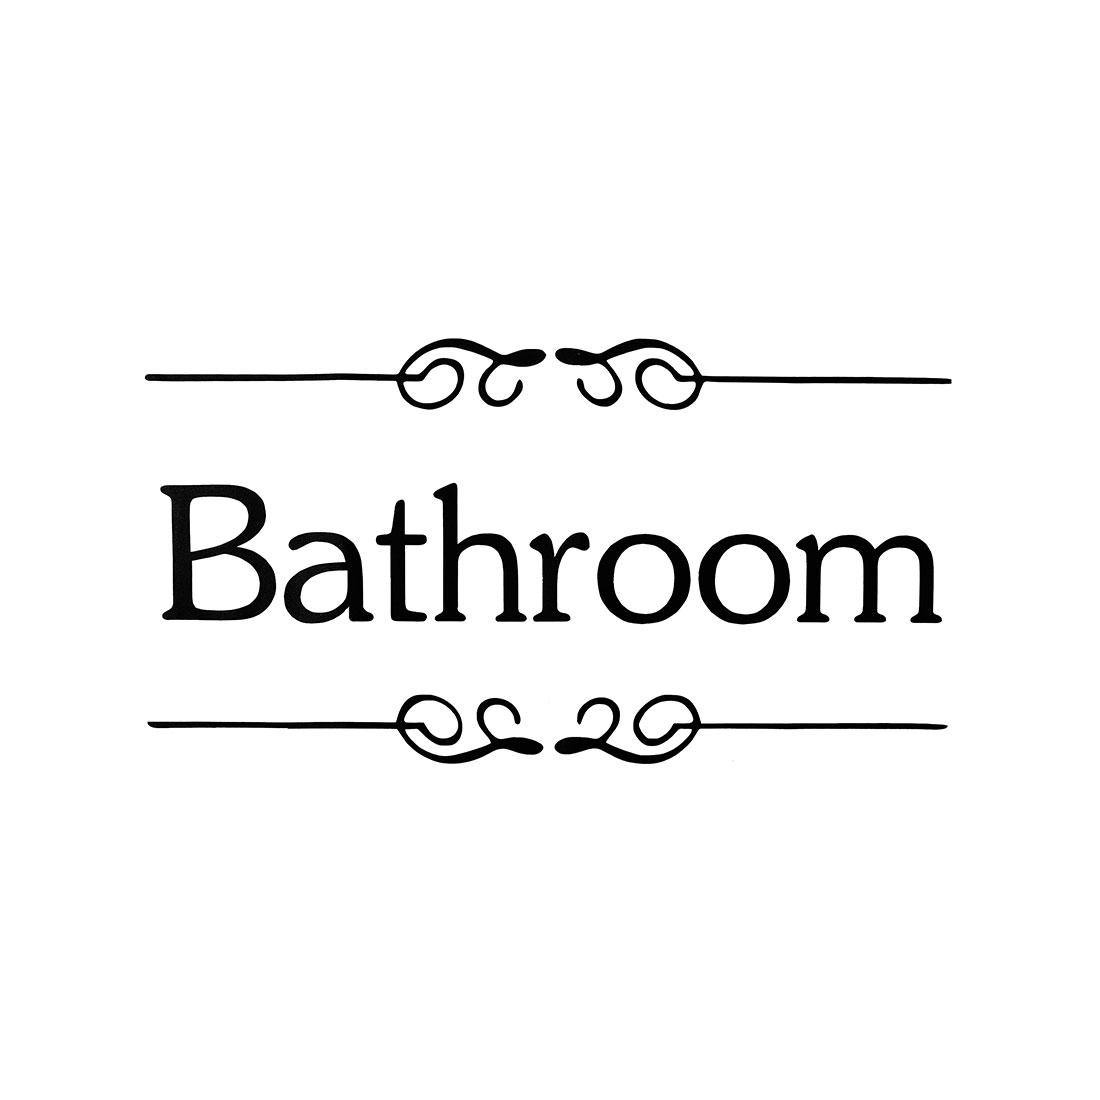 Letter Bathroom Wall Sticker Paper Decals Bathroom Washroom Apartment Decoration